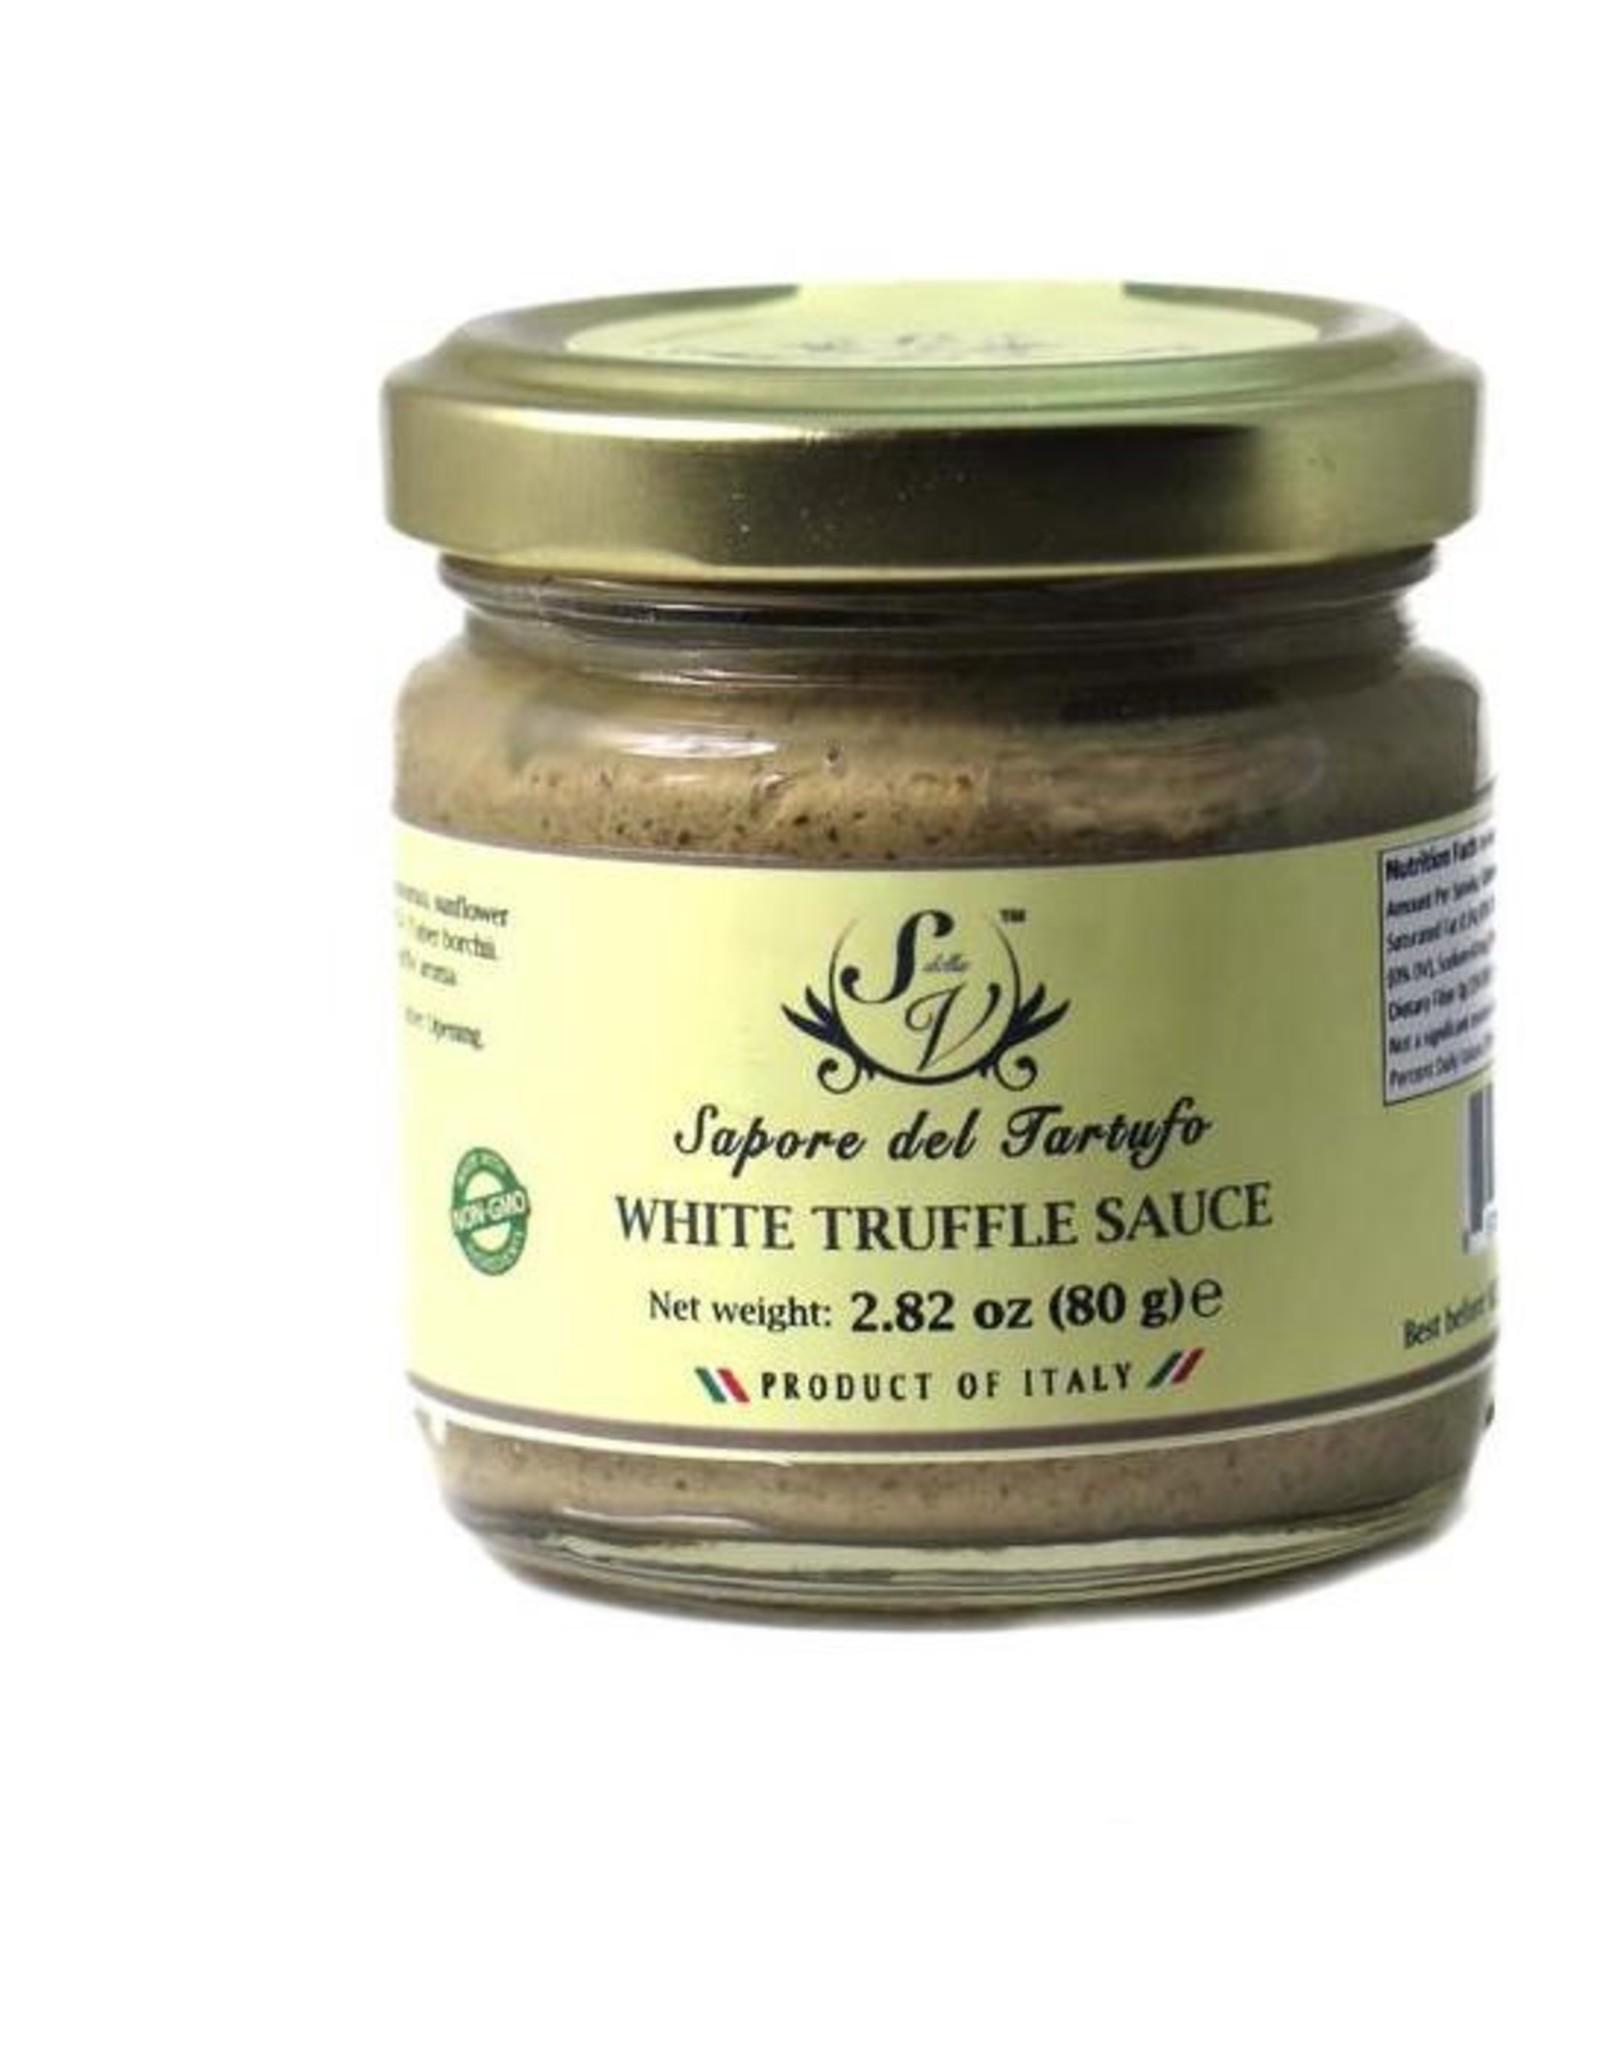 Specialty Foods Sapore del Tarfufo, White Truffle Sauce, Italy, 80g